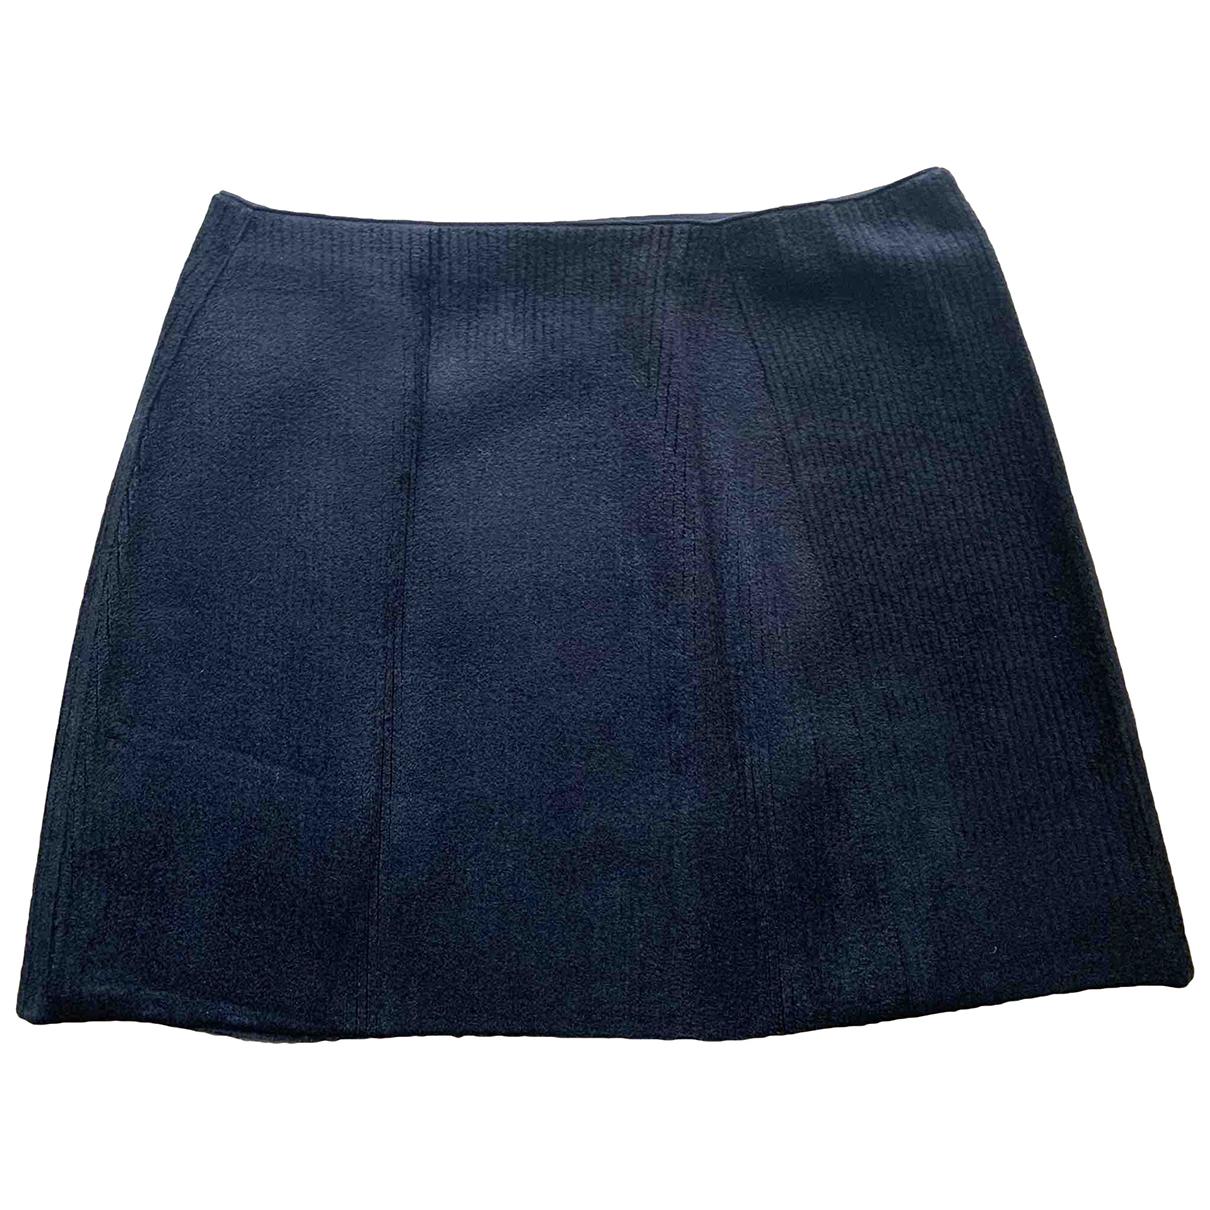 Sonia Rykiel \N Black skirt for Women 46 IT